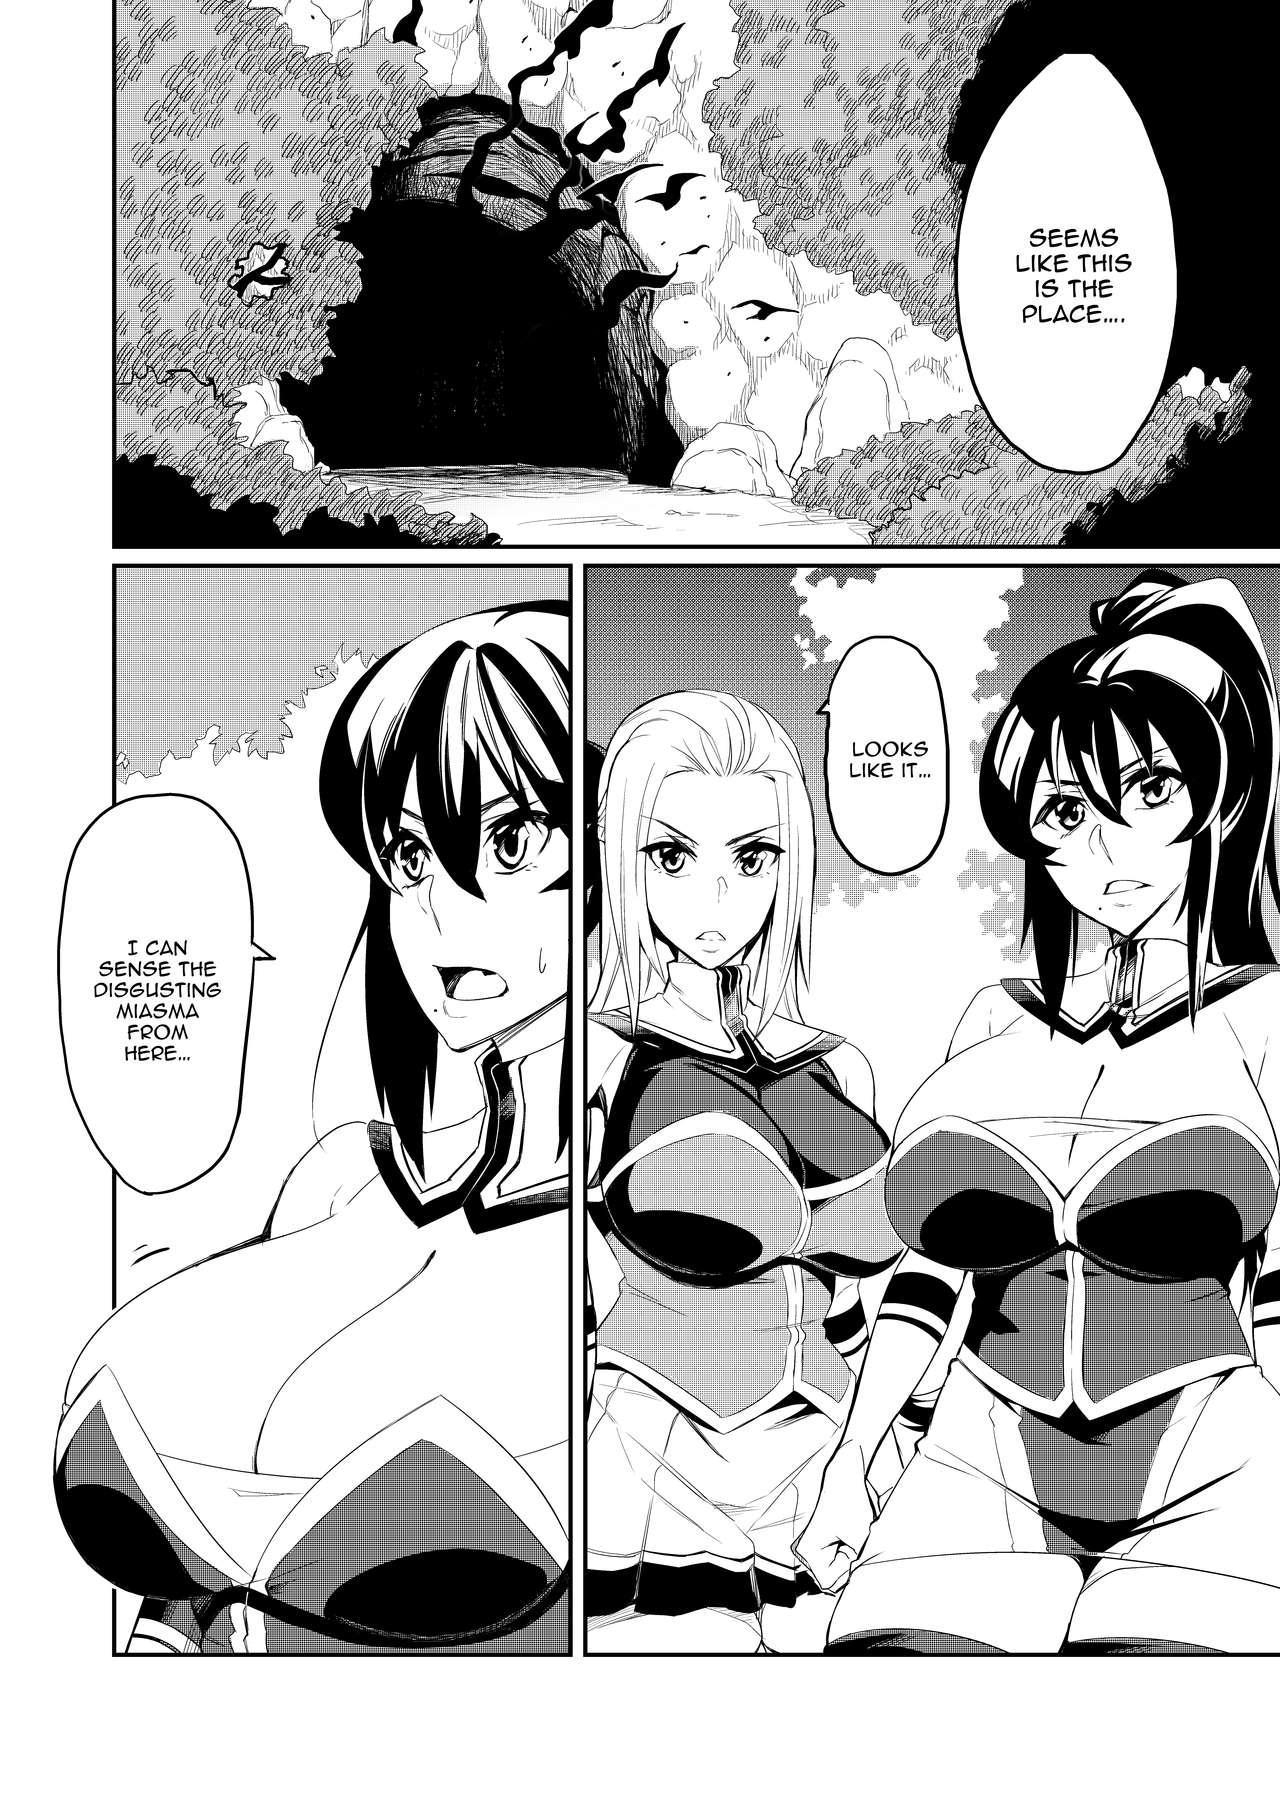 [Hatoba Akane] Demon Slaying Battle Princess Cecilia Ch. 1-8   Touma Senki Cecilia Ch. 1-8 [English] {EL JEFE Hentai Truck} 1